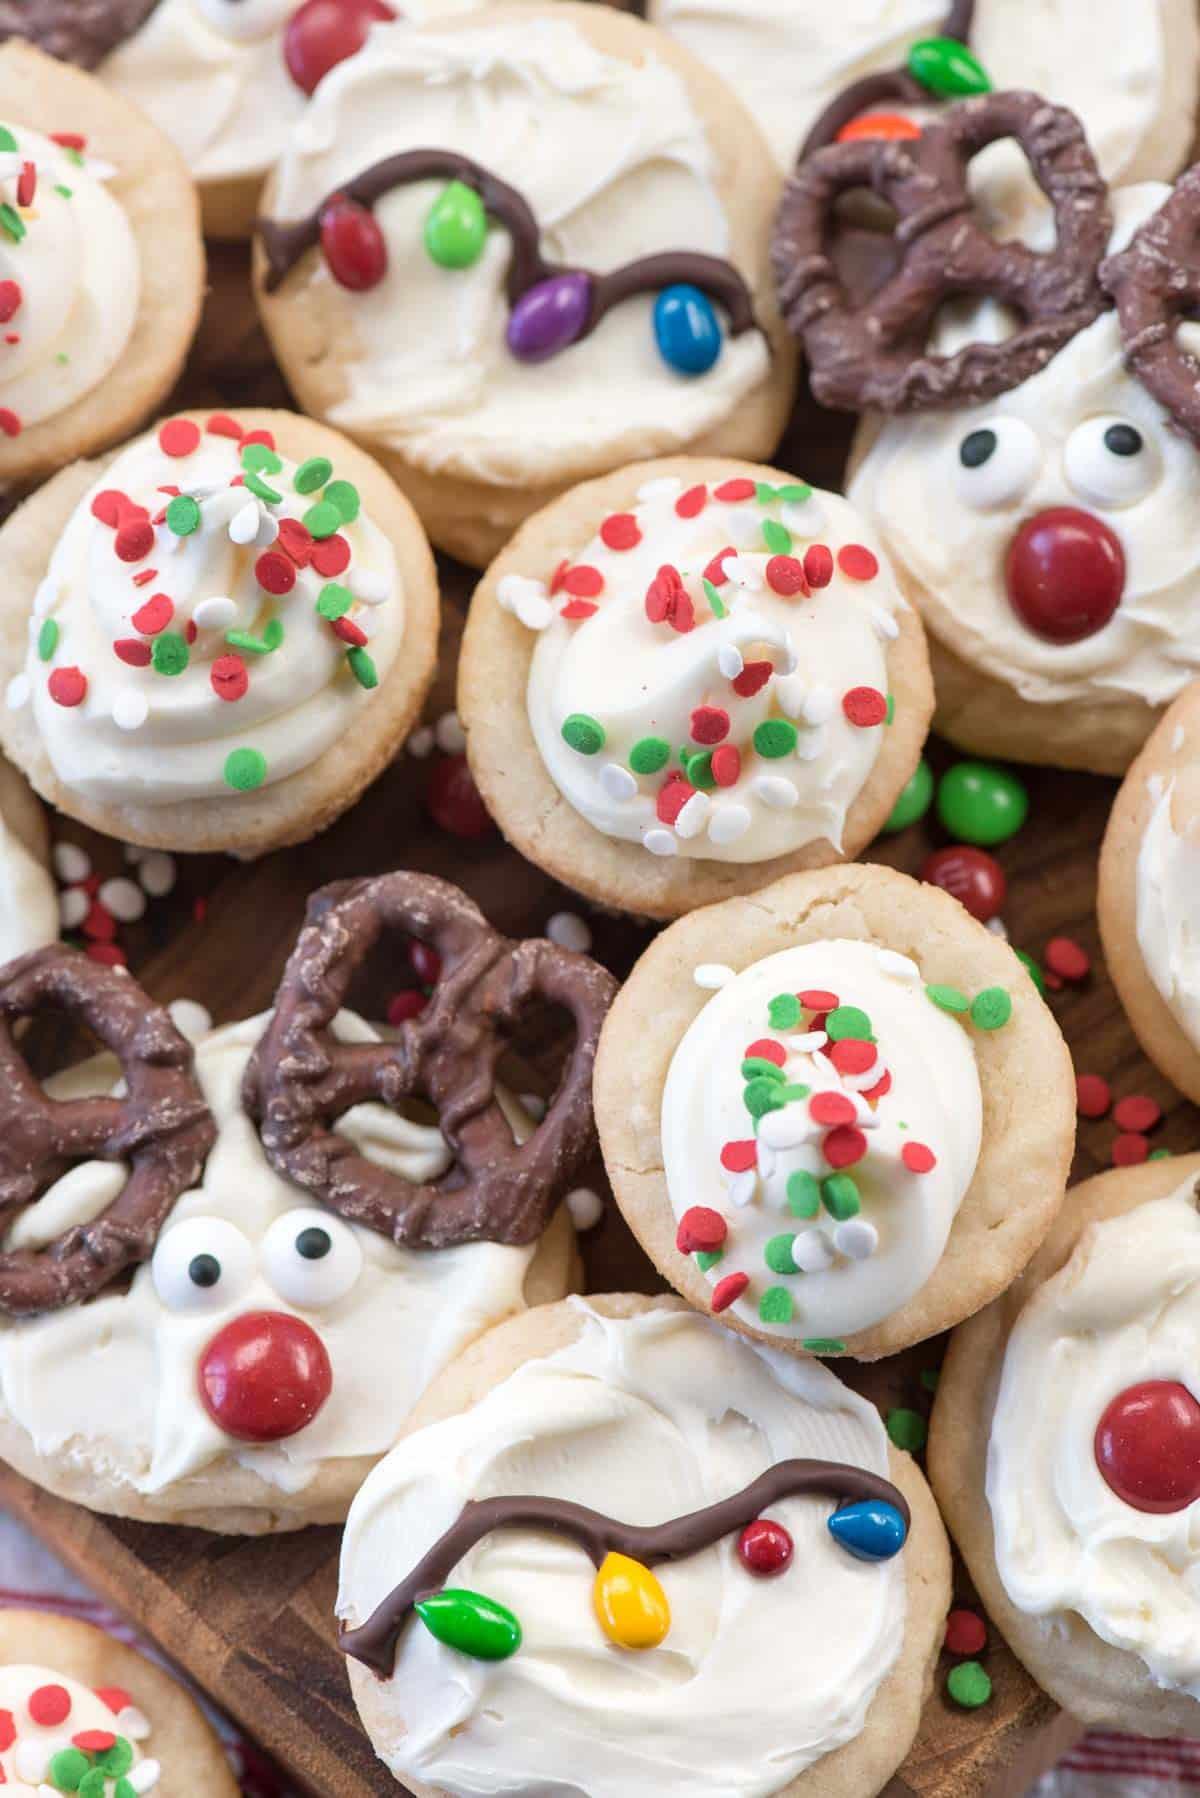 Christmas Sugar Cookies Recipe  Christmas Sugar Cookies 3 ways Crazy for Crust